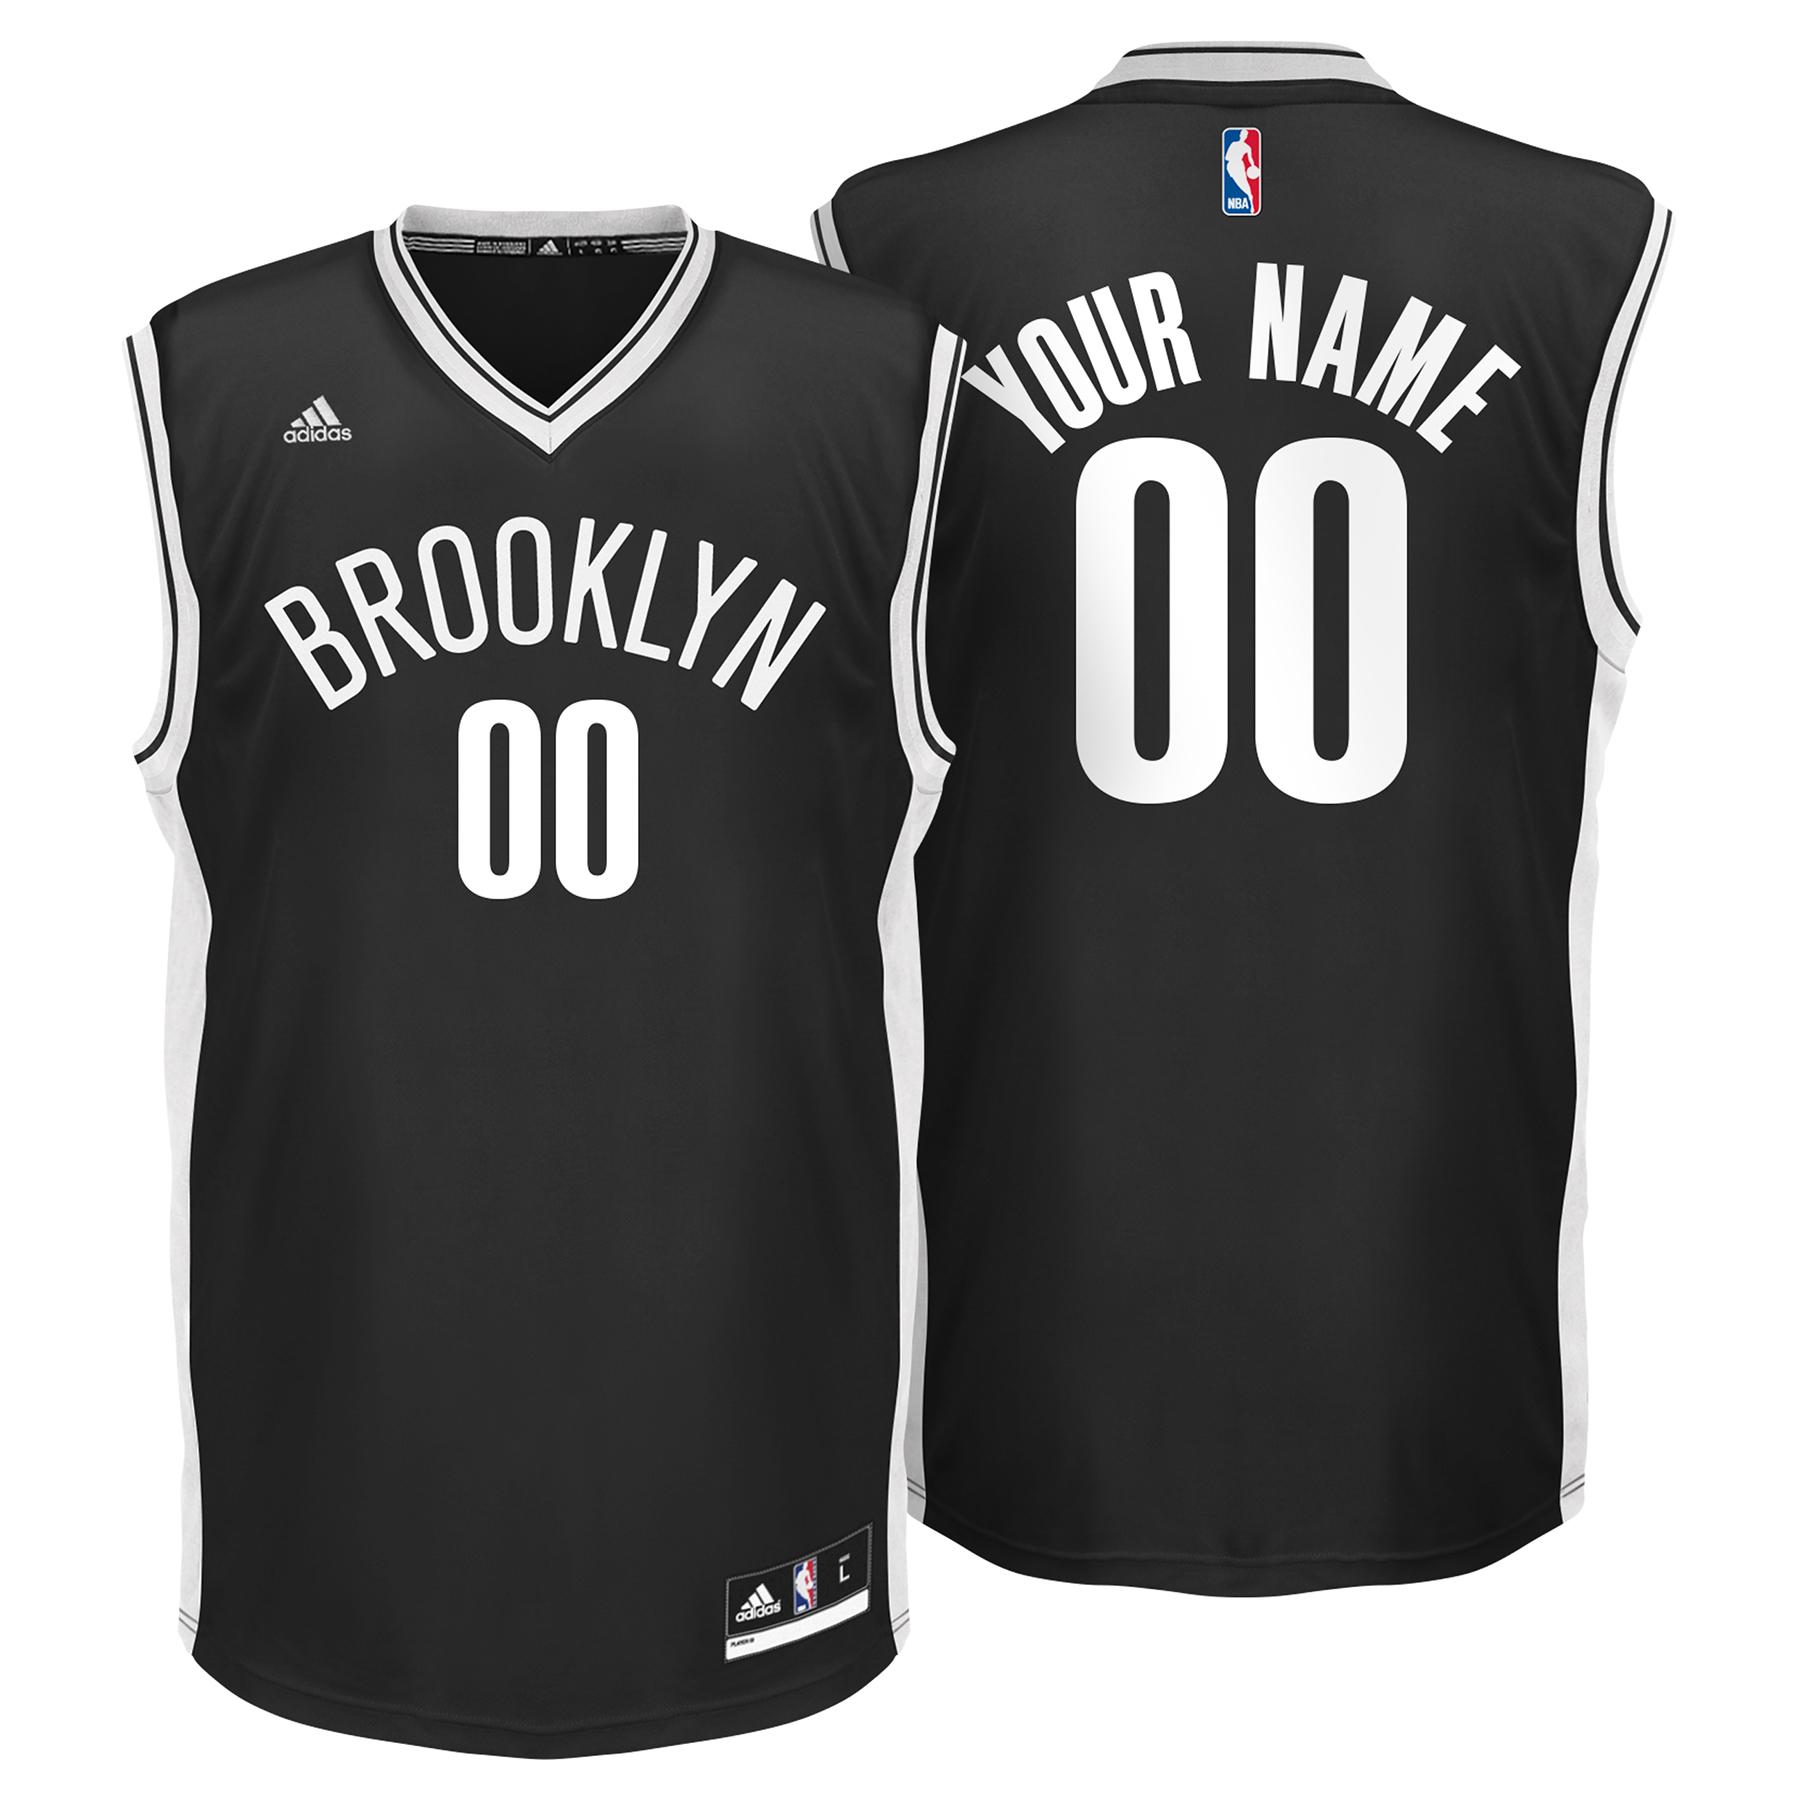 Brooklyn Nets Road Replica Jersey - Custom - Mens